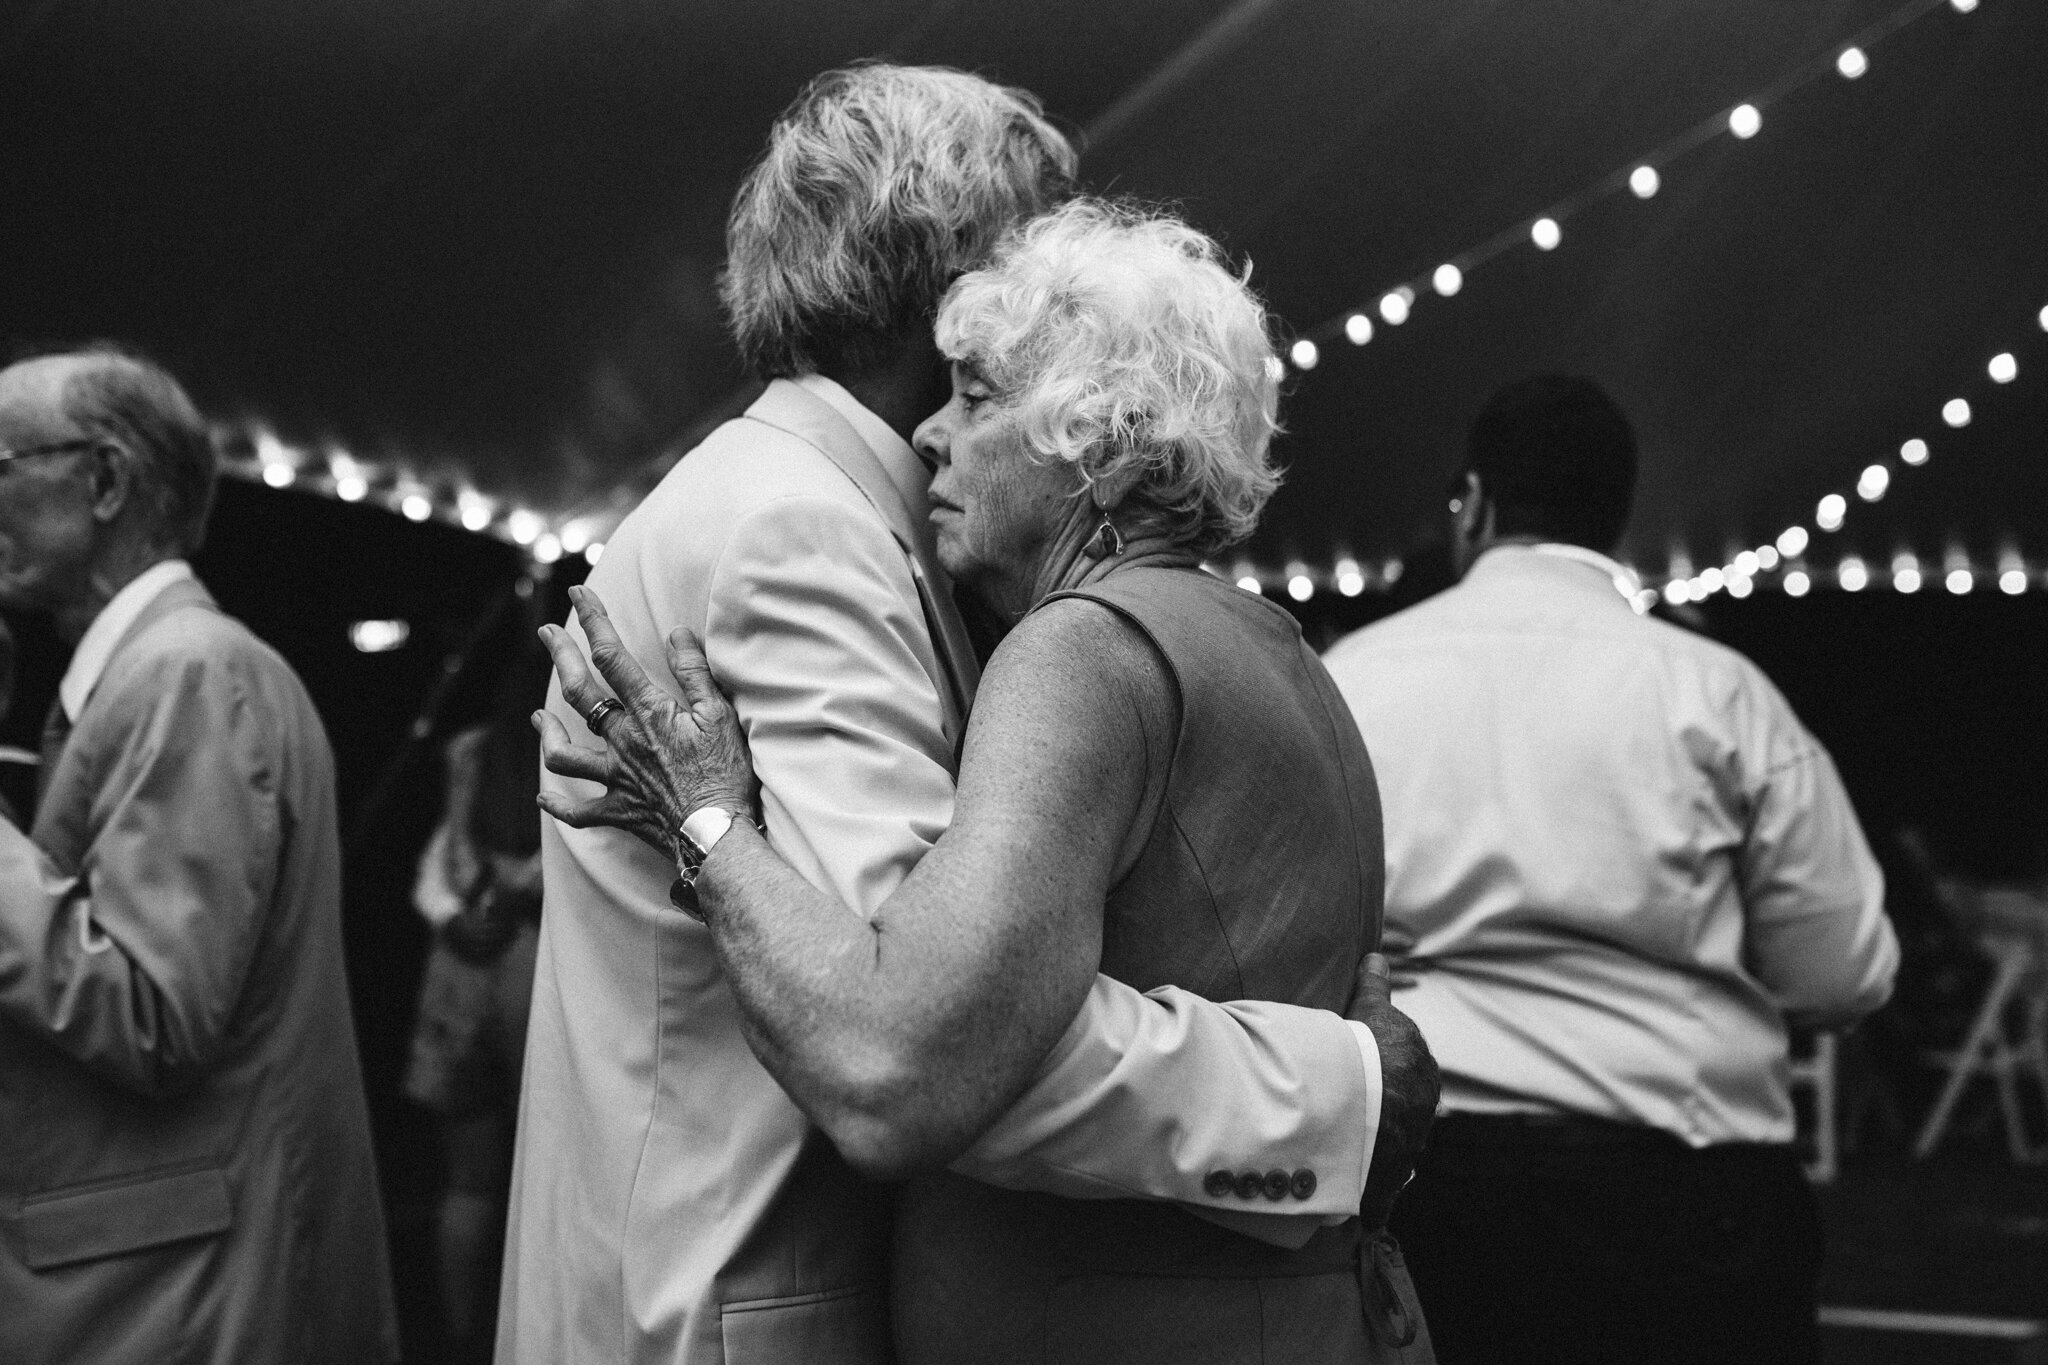 angela_jason_norfolk_wedding-190.jpg